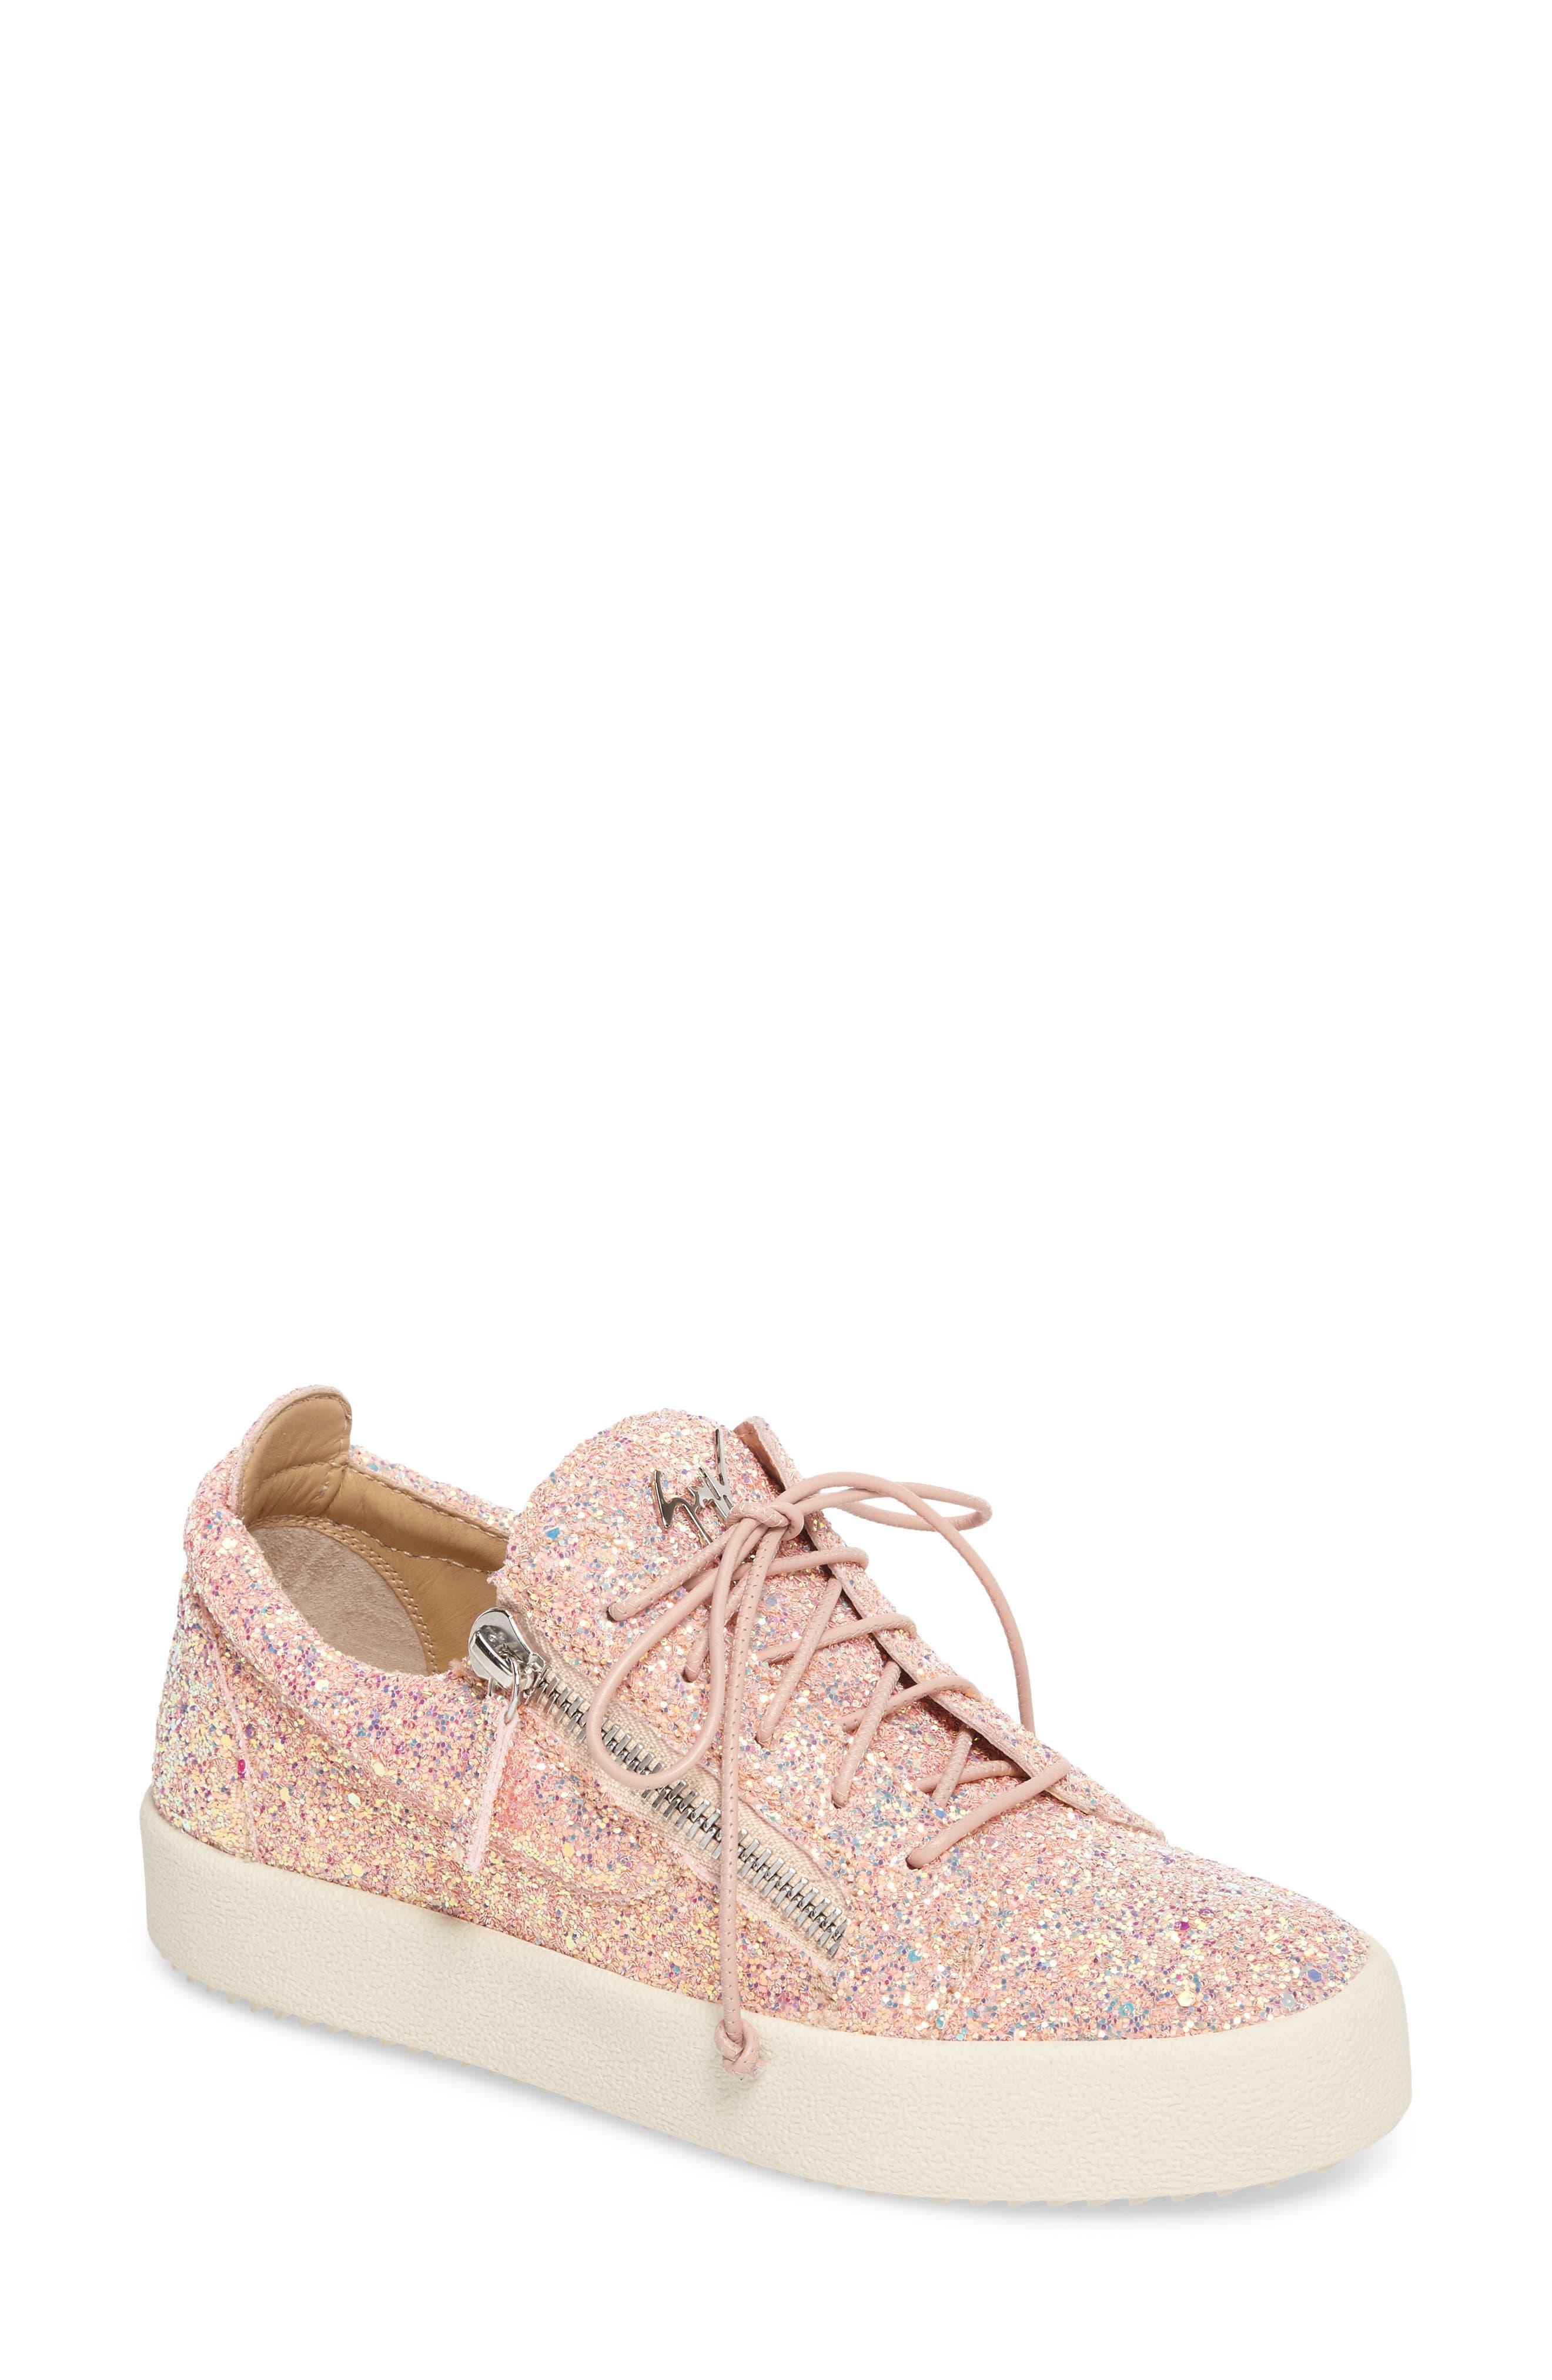 Alternate Image 1 Selected - Giuseppe Zanotti May London Low Top Sneaker (Women)